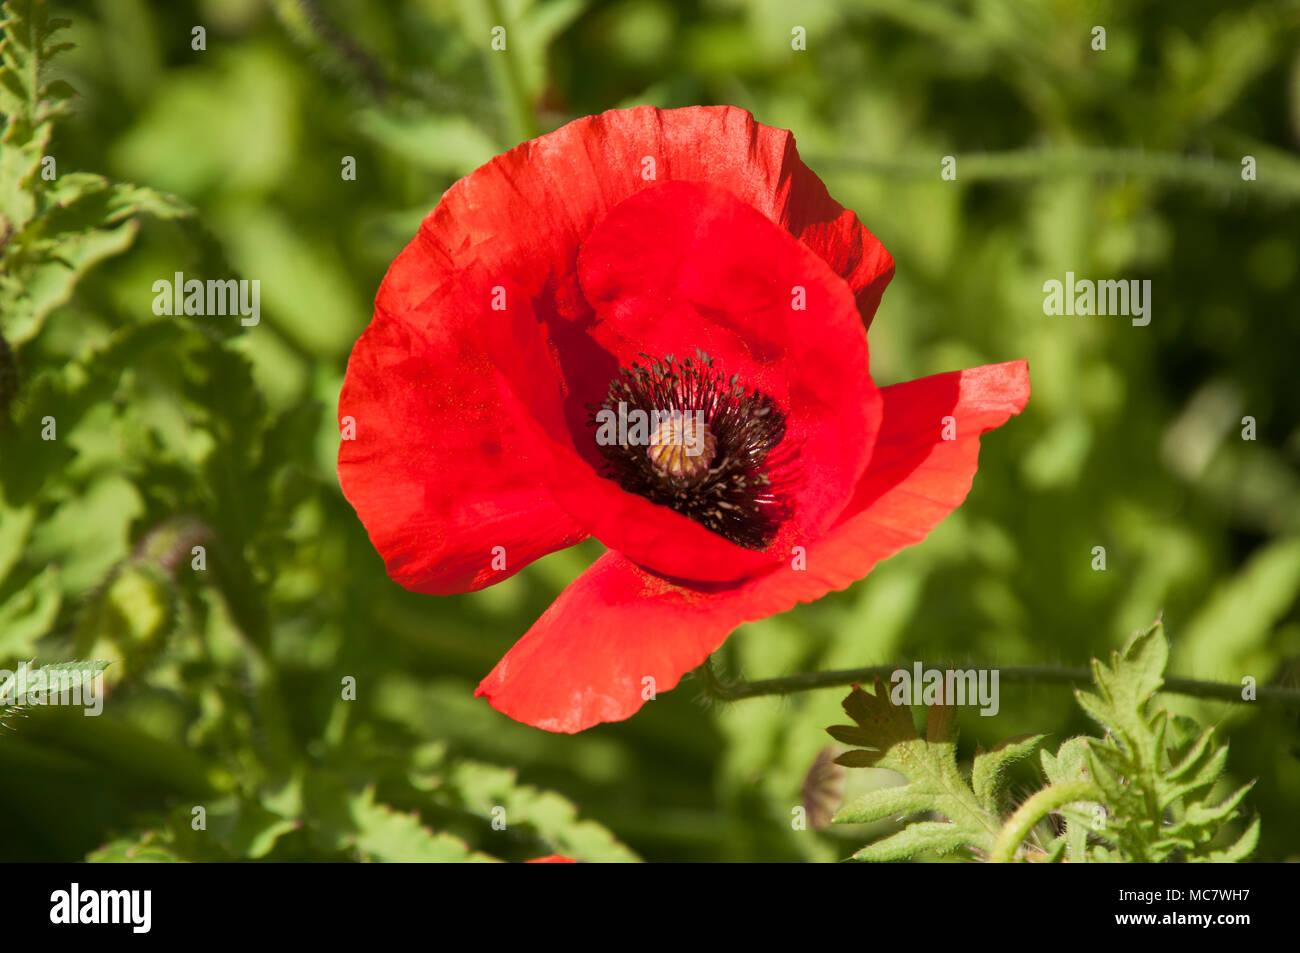 Sydney Australia Flanders Poppy A Red Poppy With Black Centre Stock